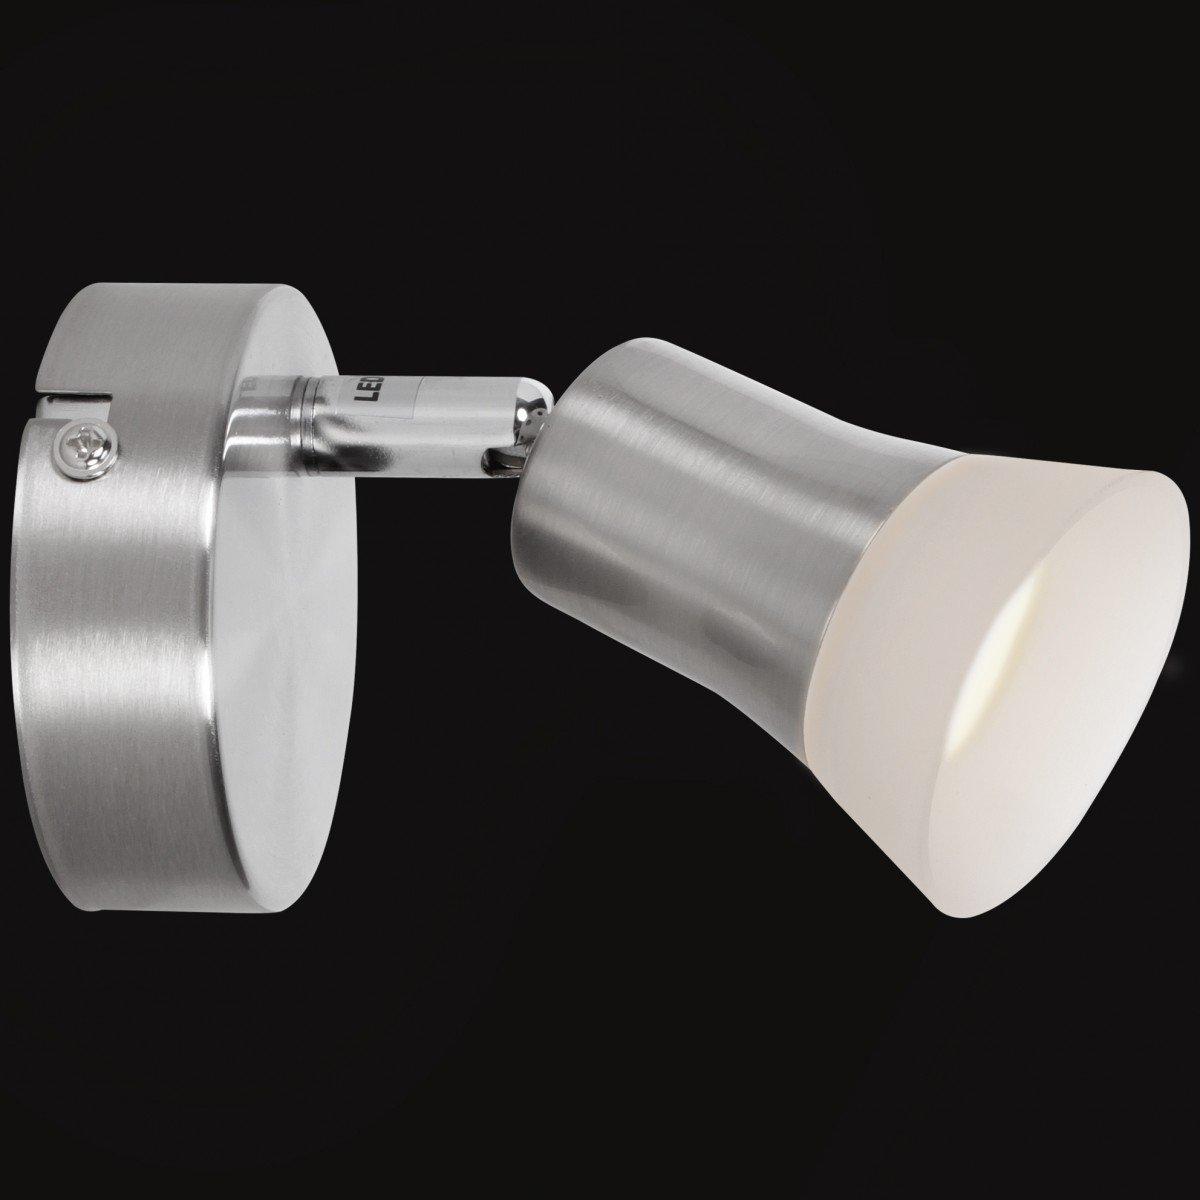 Wohnling Clara LED-Spot 6-flammig, Metall, 19x16x55 Silber, 19x16x55 Metall, cm 423a87